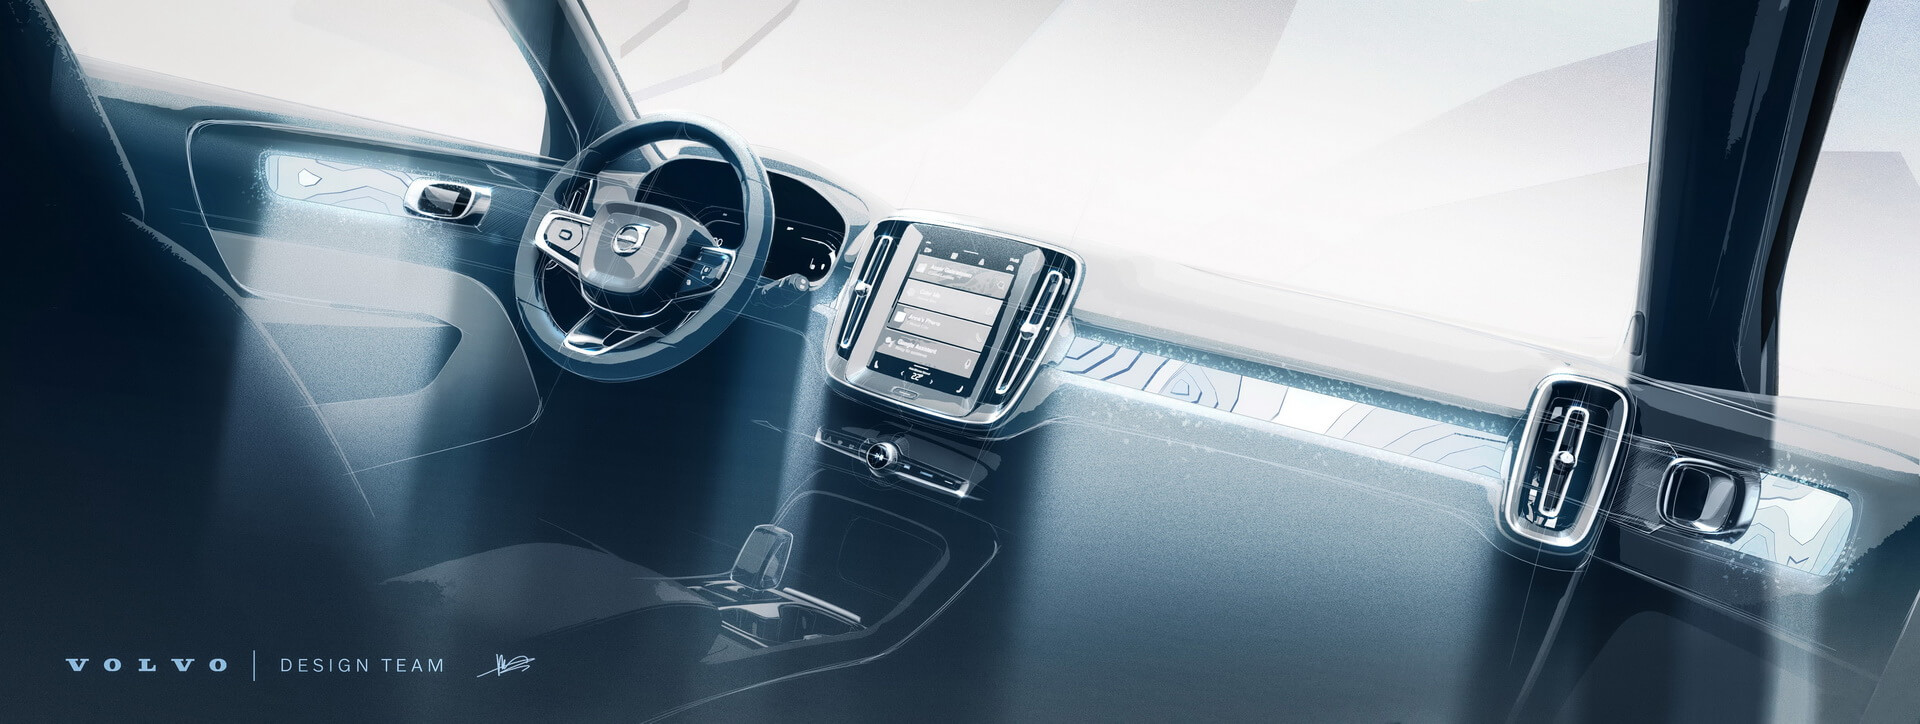 Эскиз интерьера электрокроссовера Volvo C40 Recharge